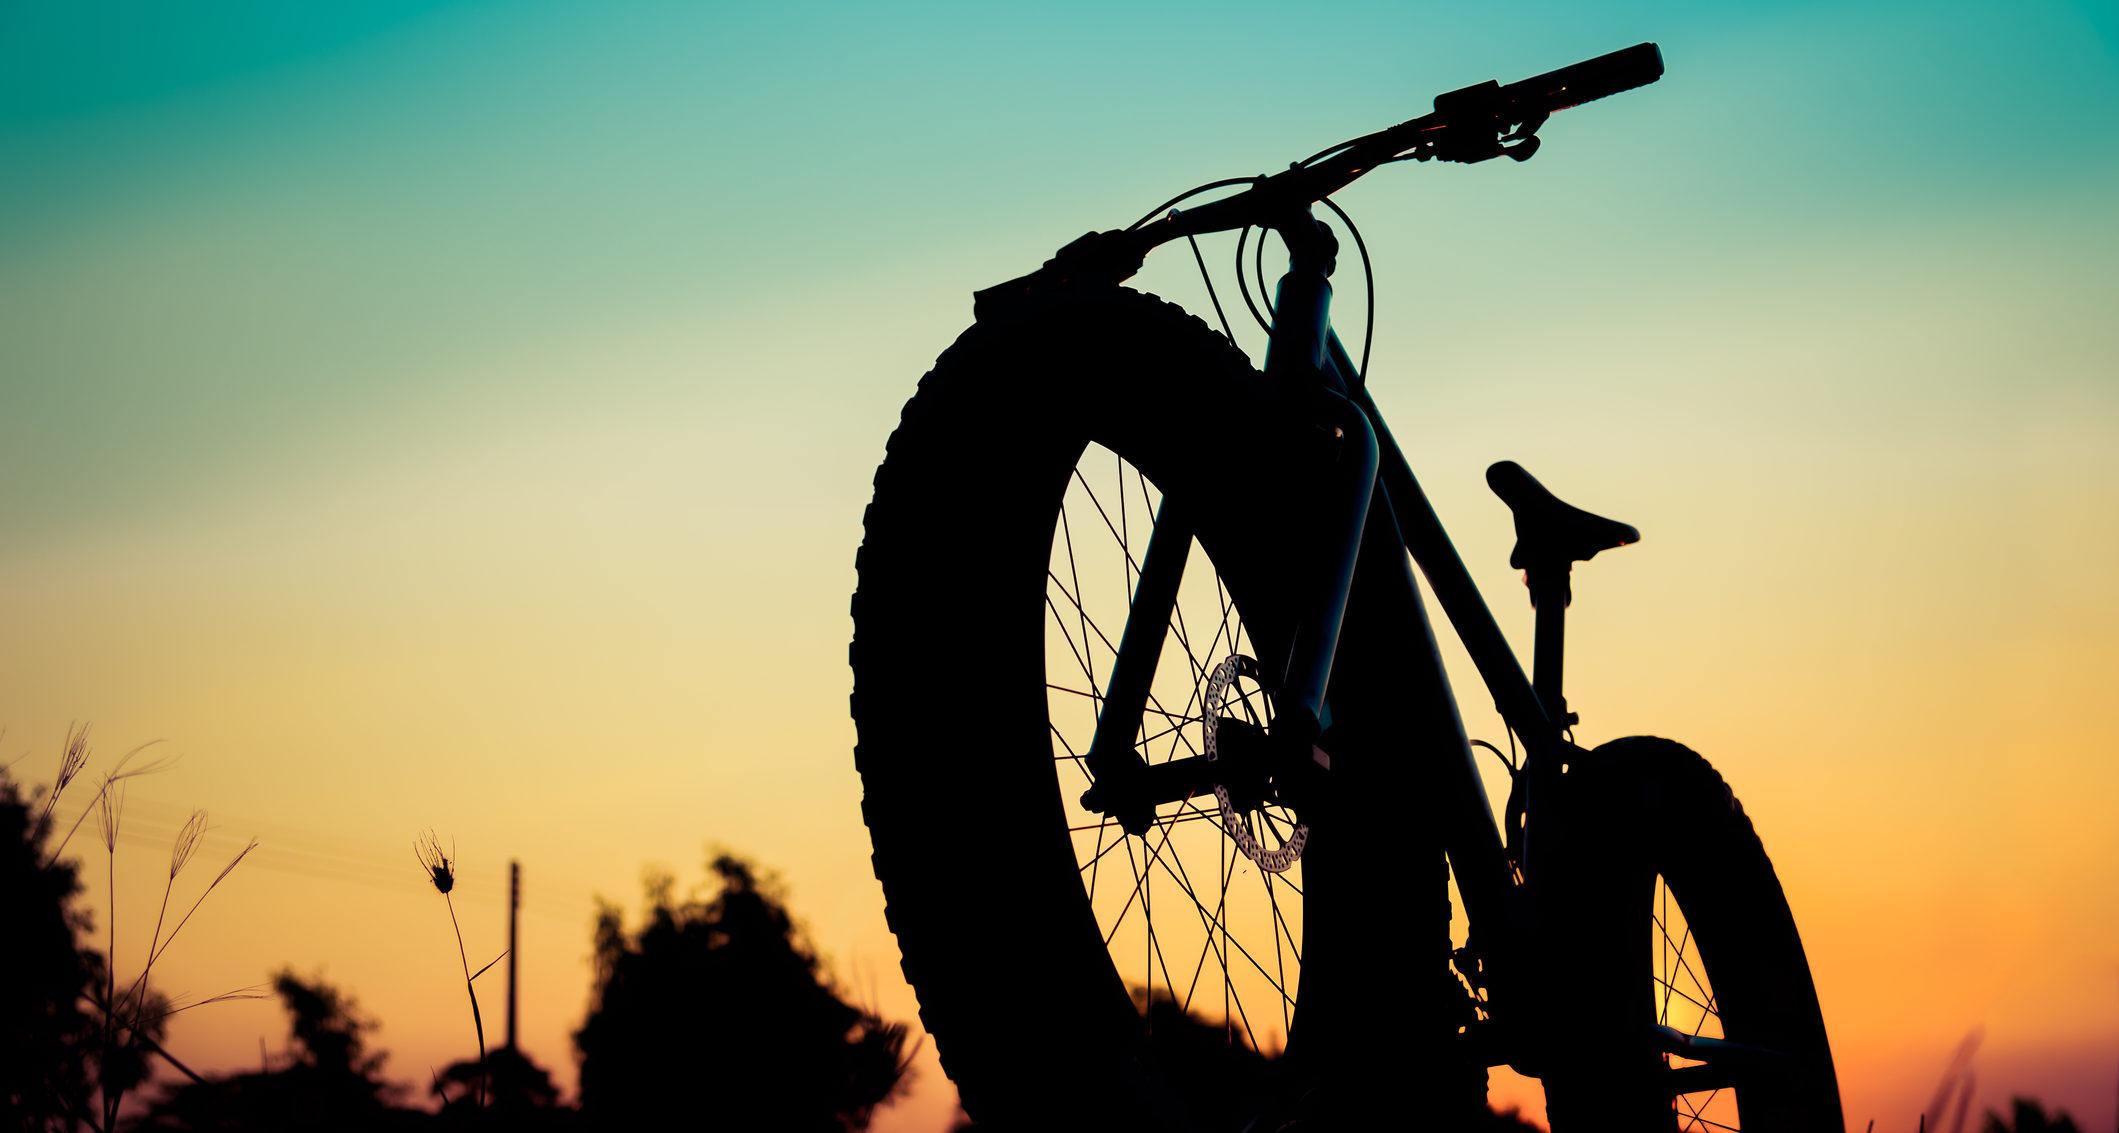 Mountain Bike © Anat Sukeewong | Dreamstime 67564504